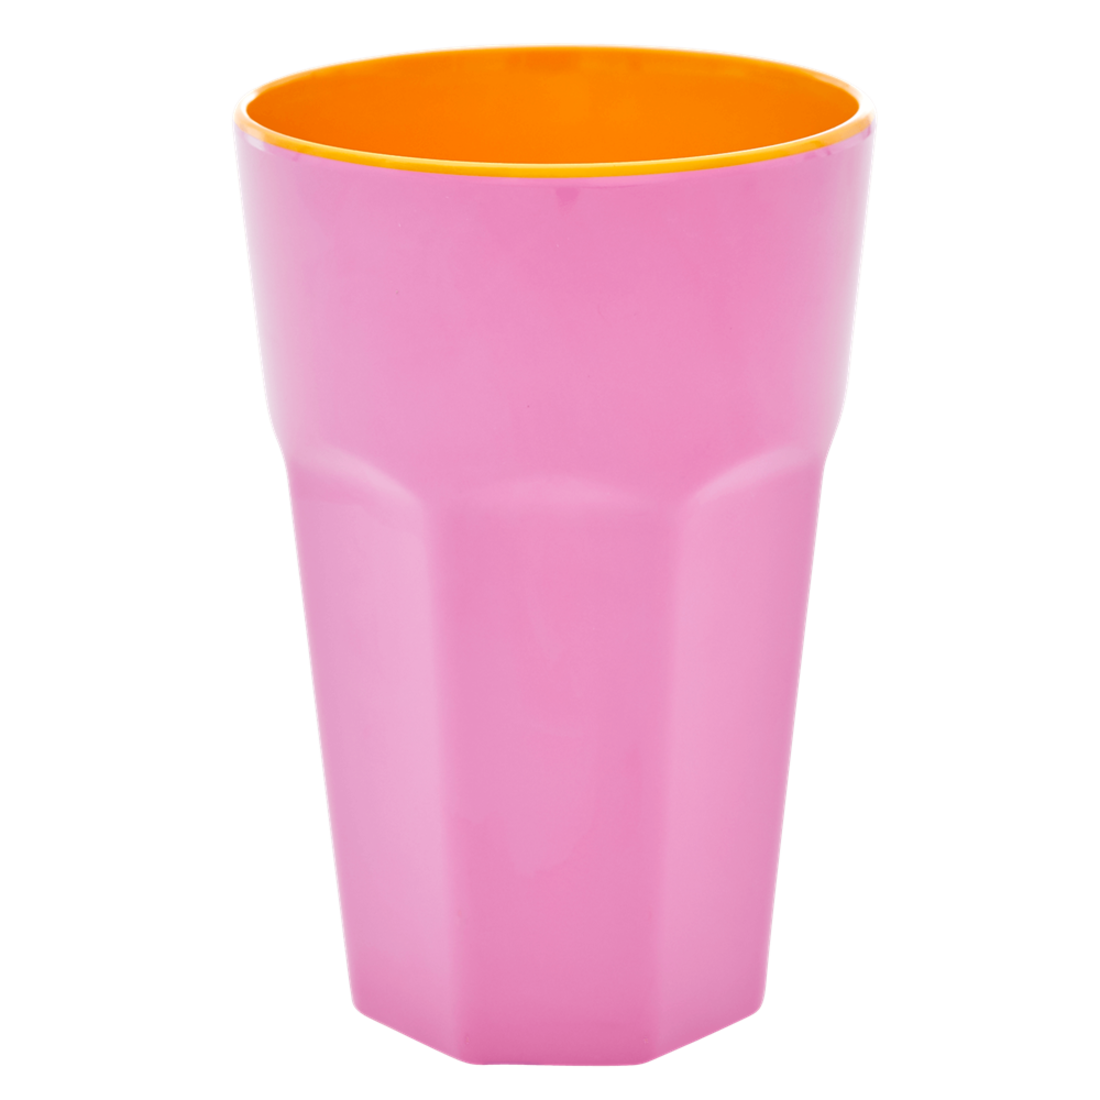 Rice Becher Melamin pink - orange